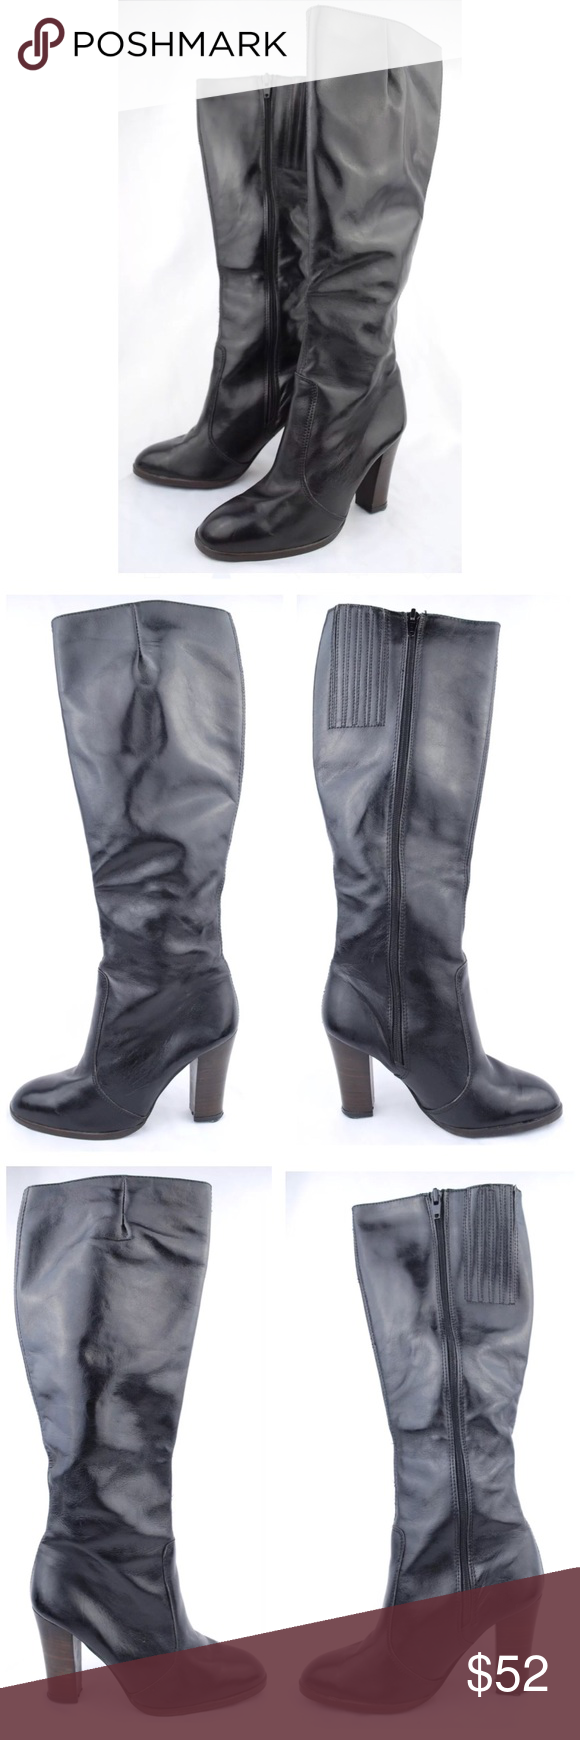 75248411ff Carlos Sanchez Women's Black High Heel Boots Carlos Sanchez Women's Black  High Heel Boots Size 6B